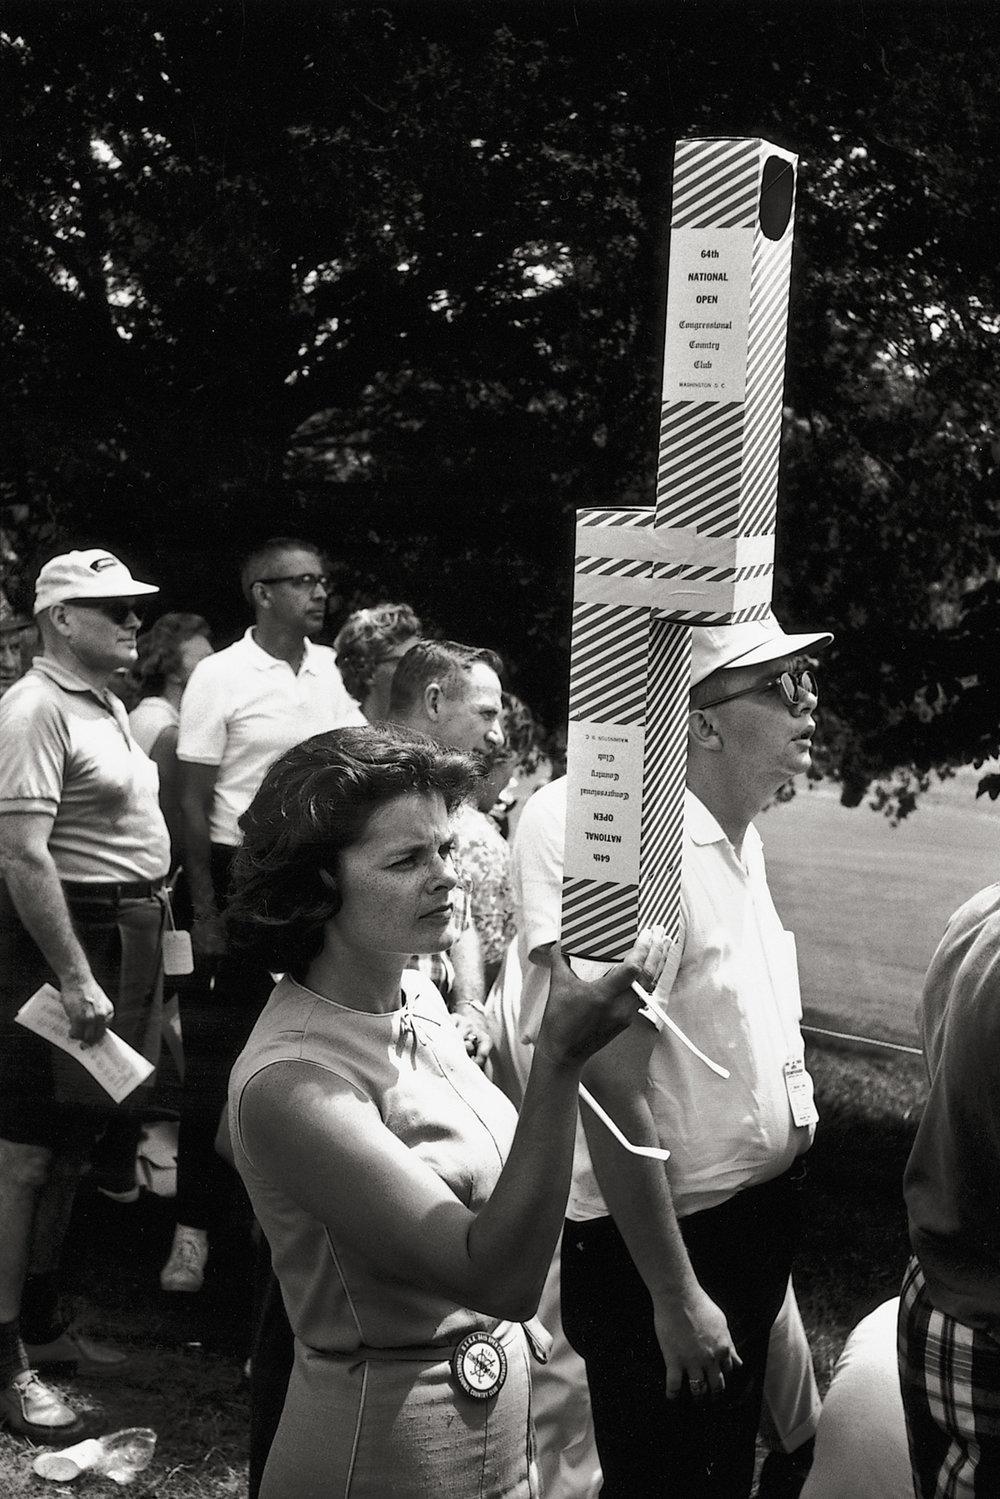 U.S. Open, Congressional Country Club, Bethesda, Maryland, 1964